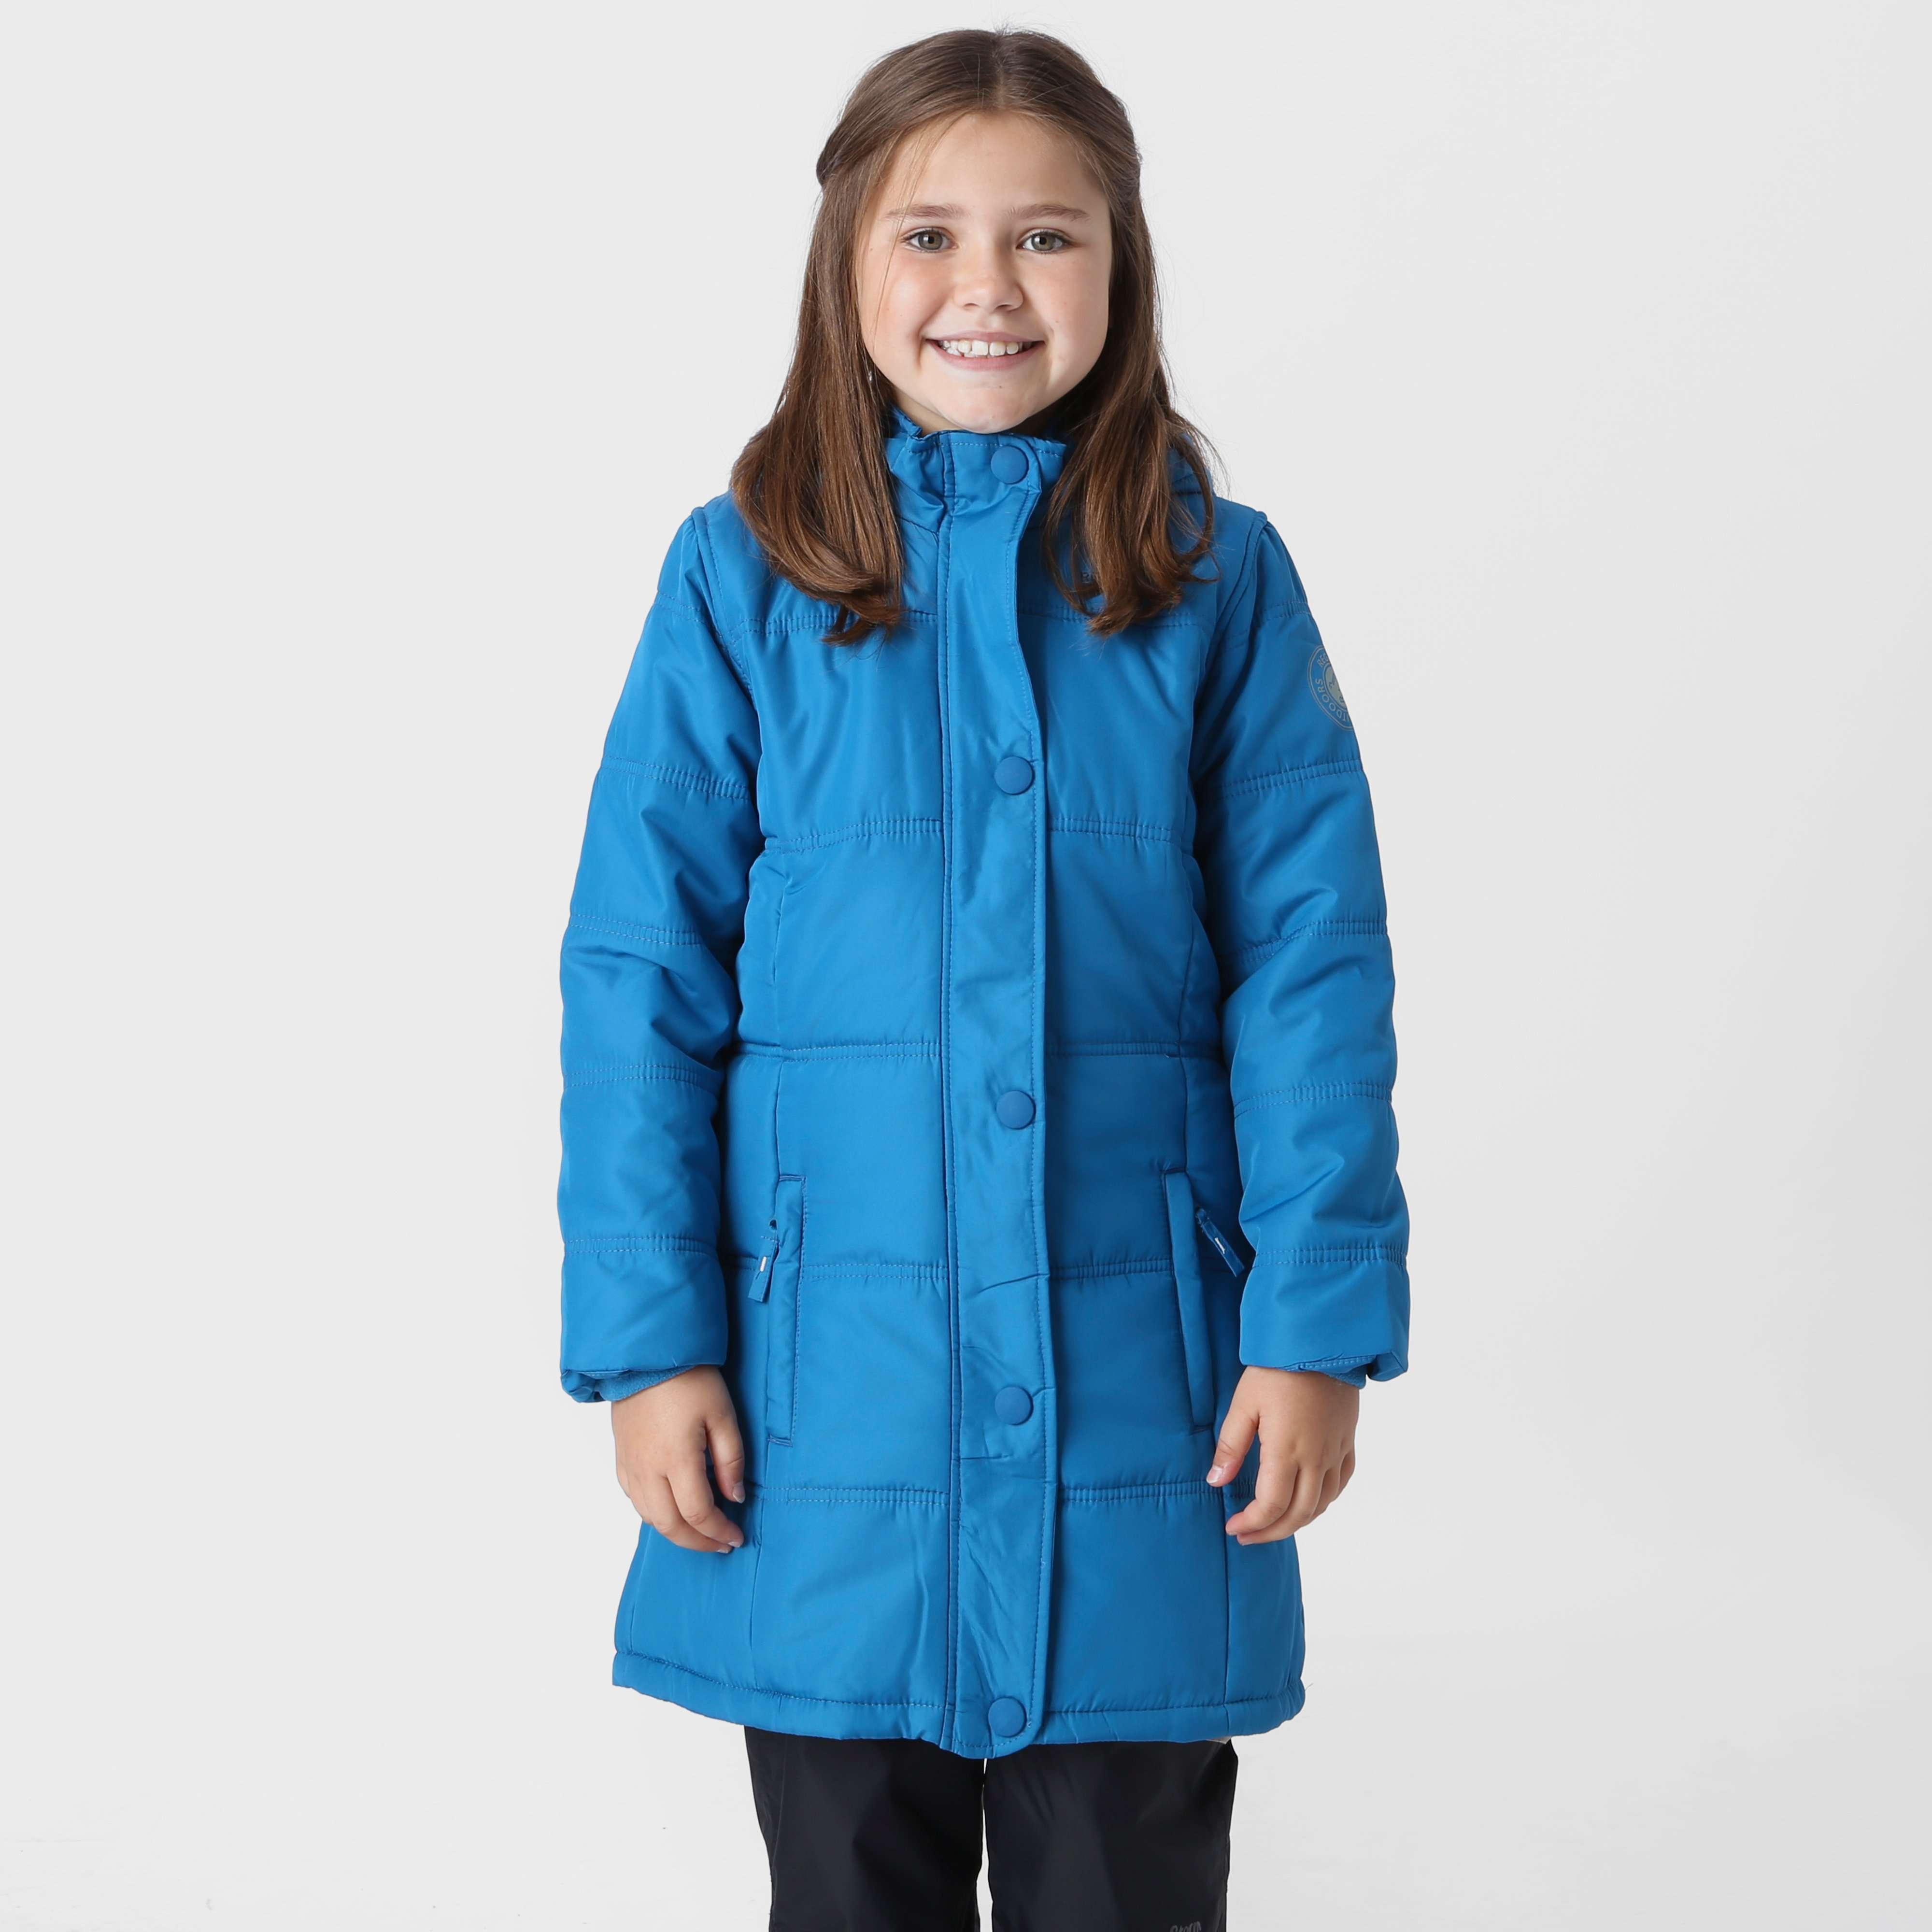 REGATTA Girl's Winter Hill Quilted Jacket